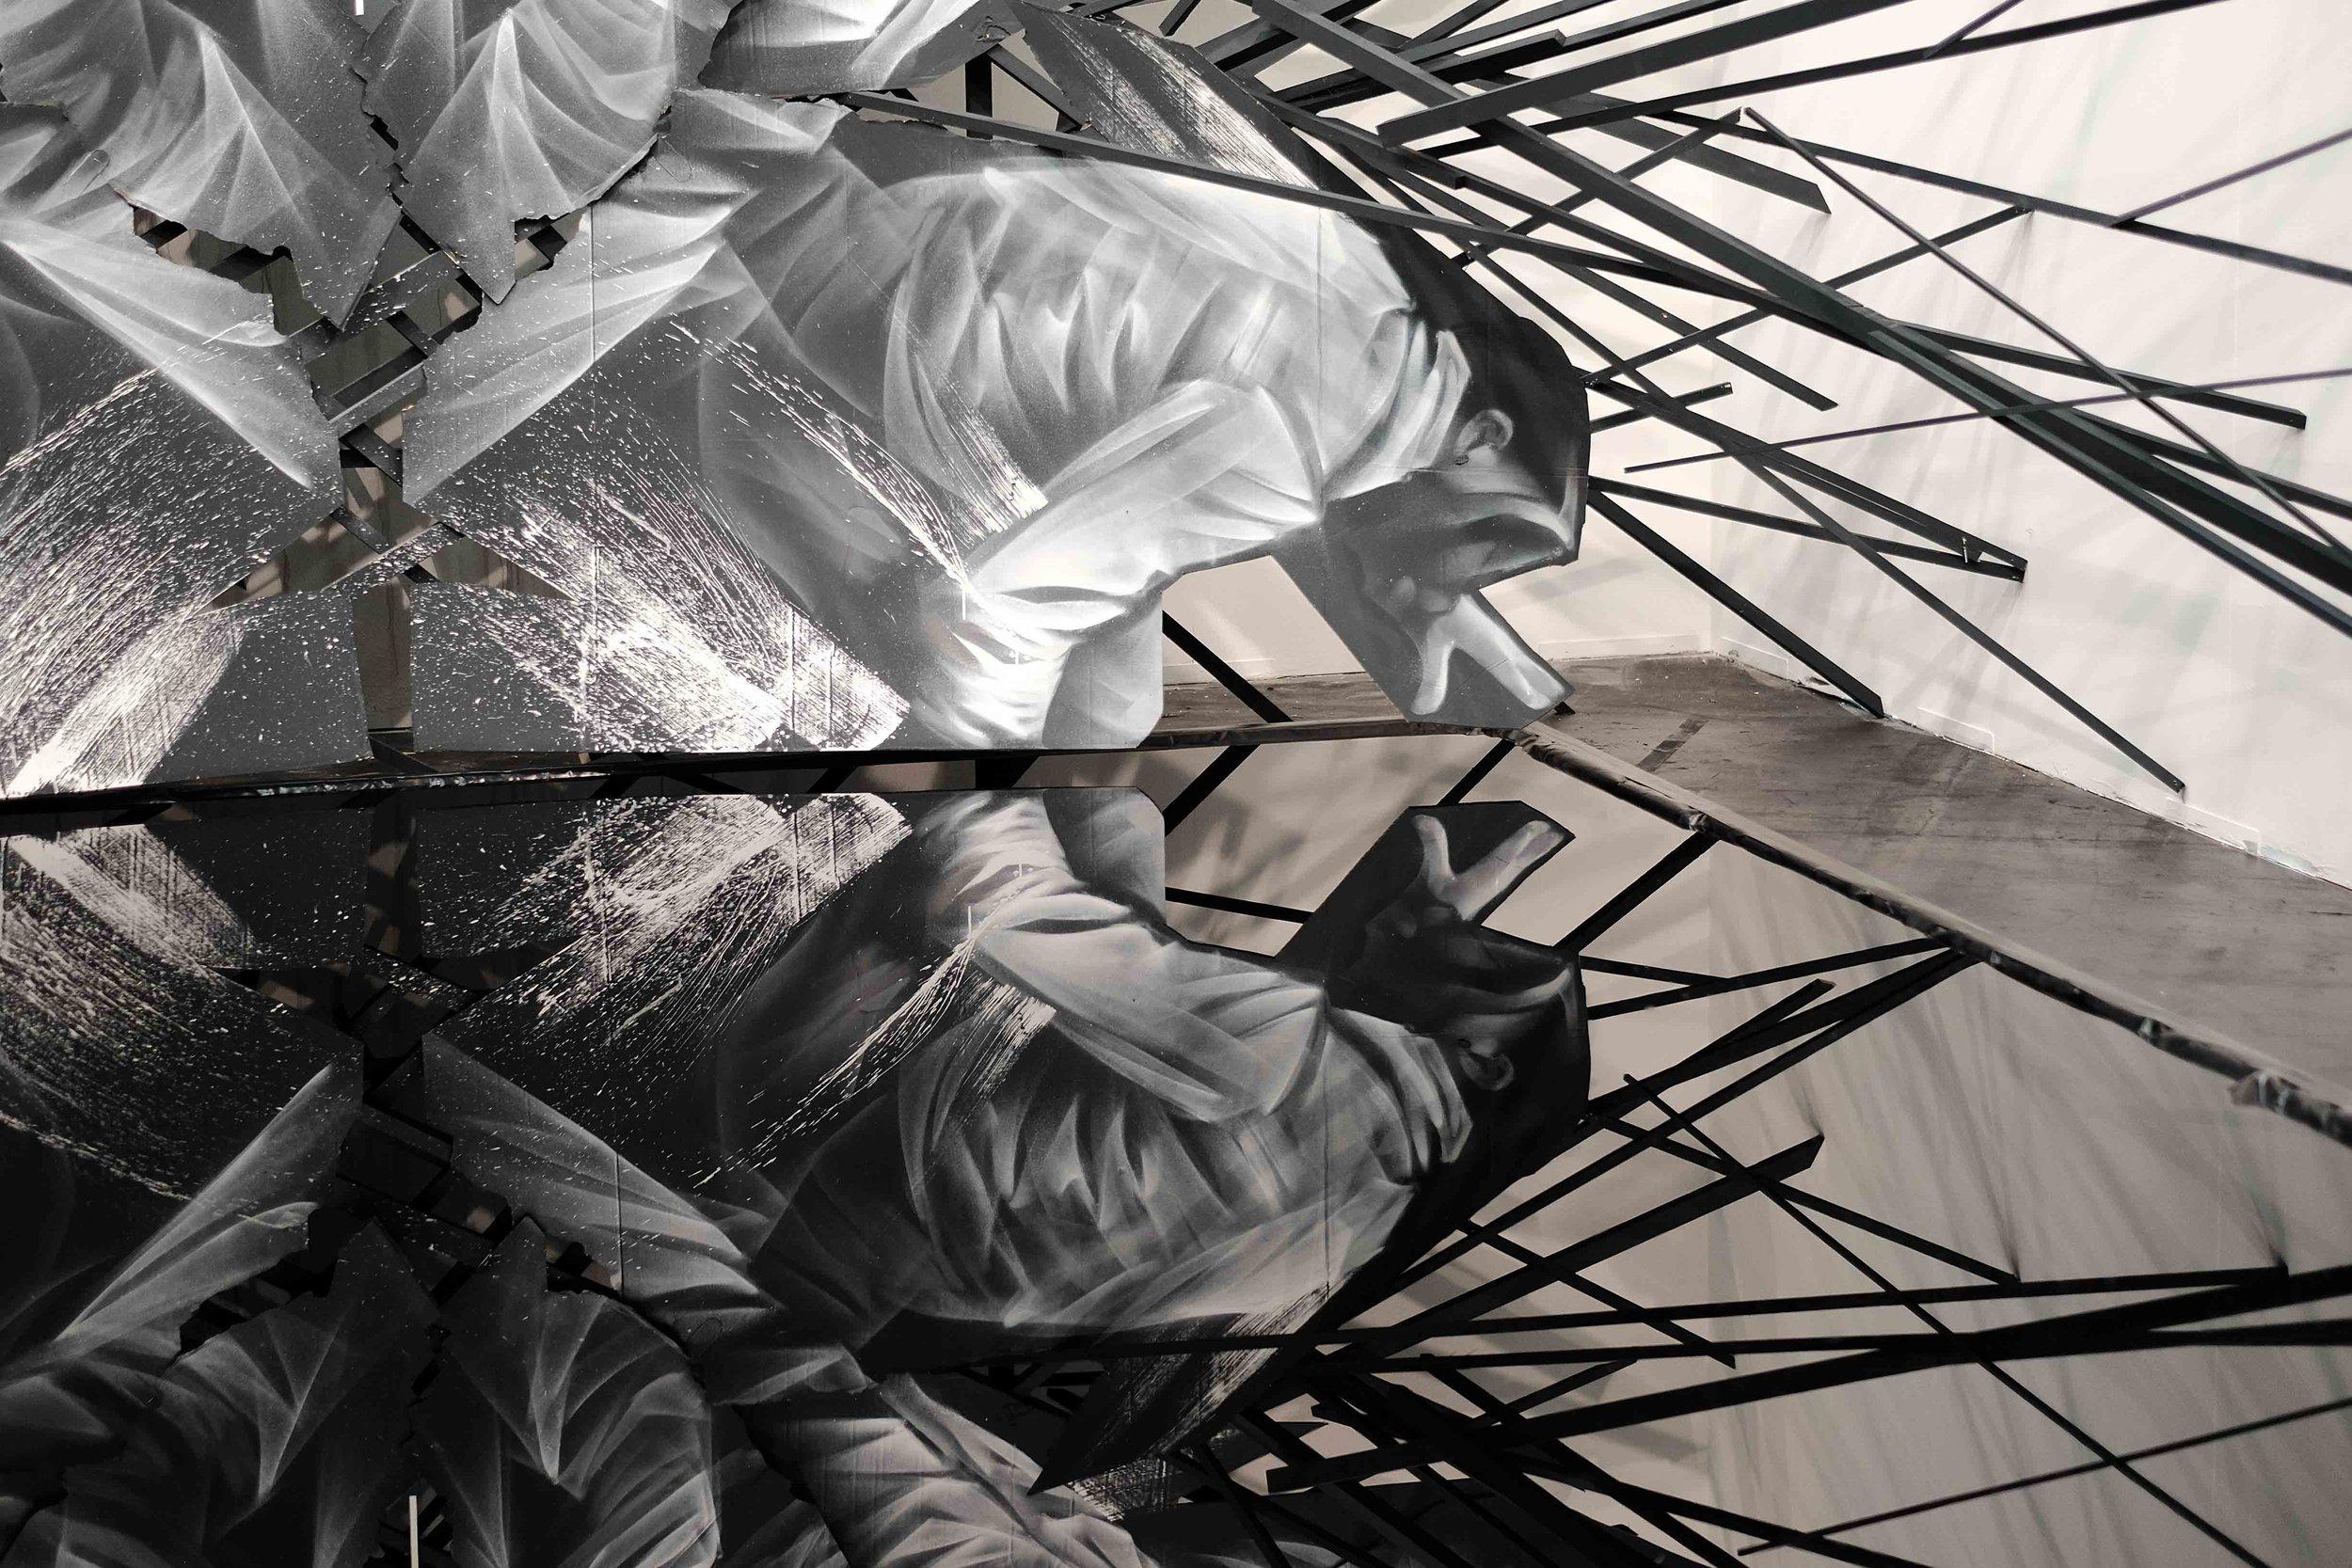 artfair-wearecity-2016-simonhariman-atheneadiapoulis-149.jpg